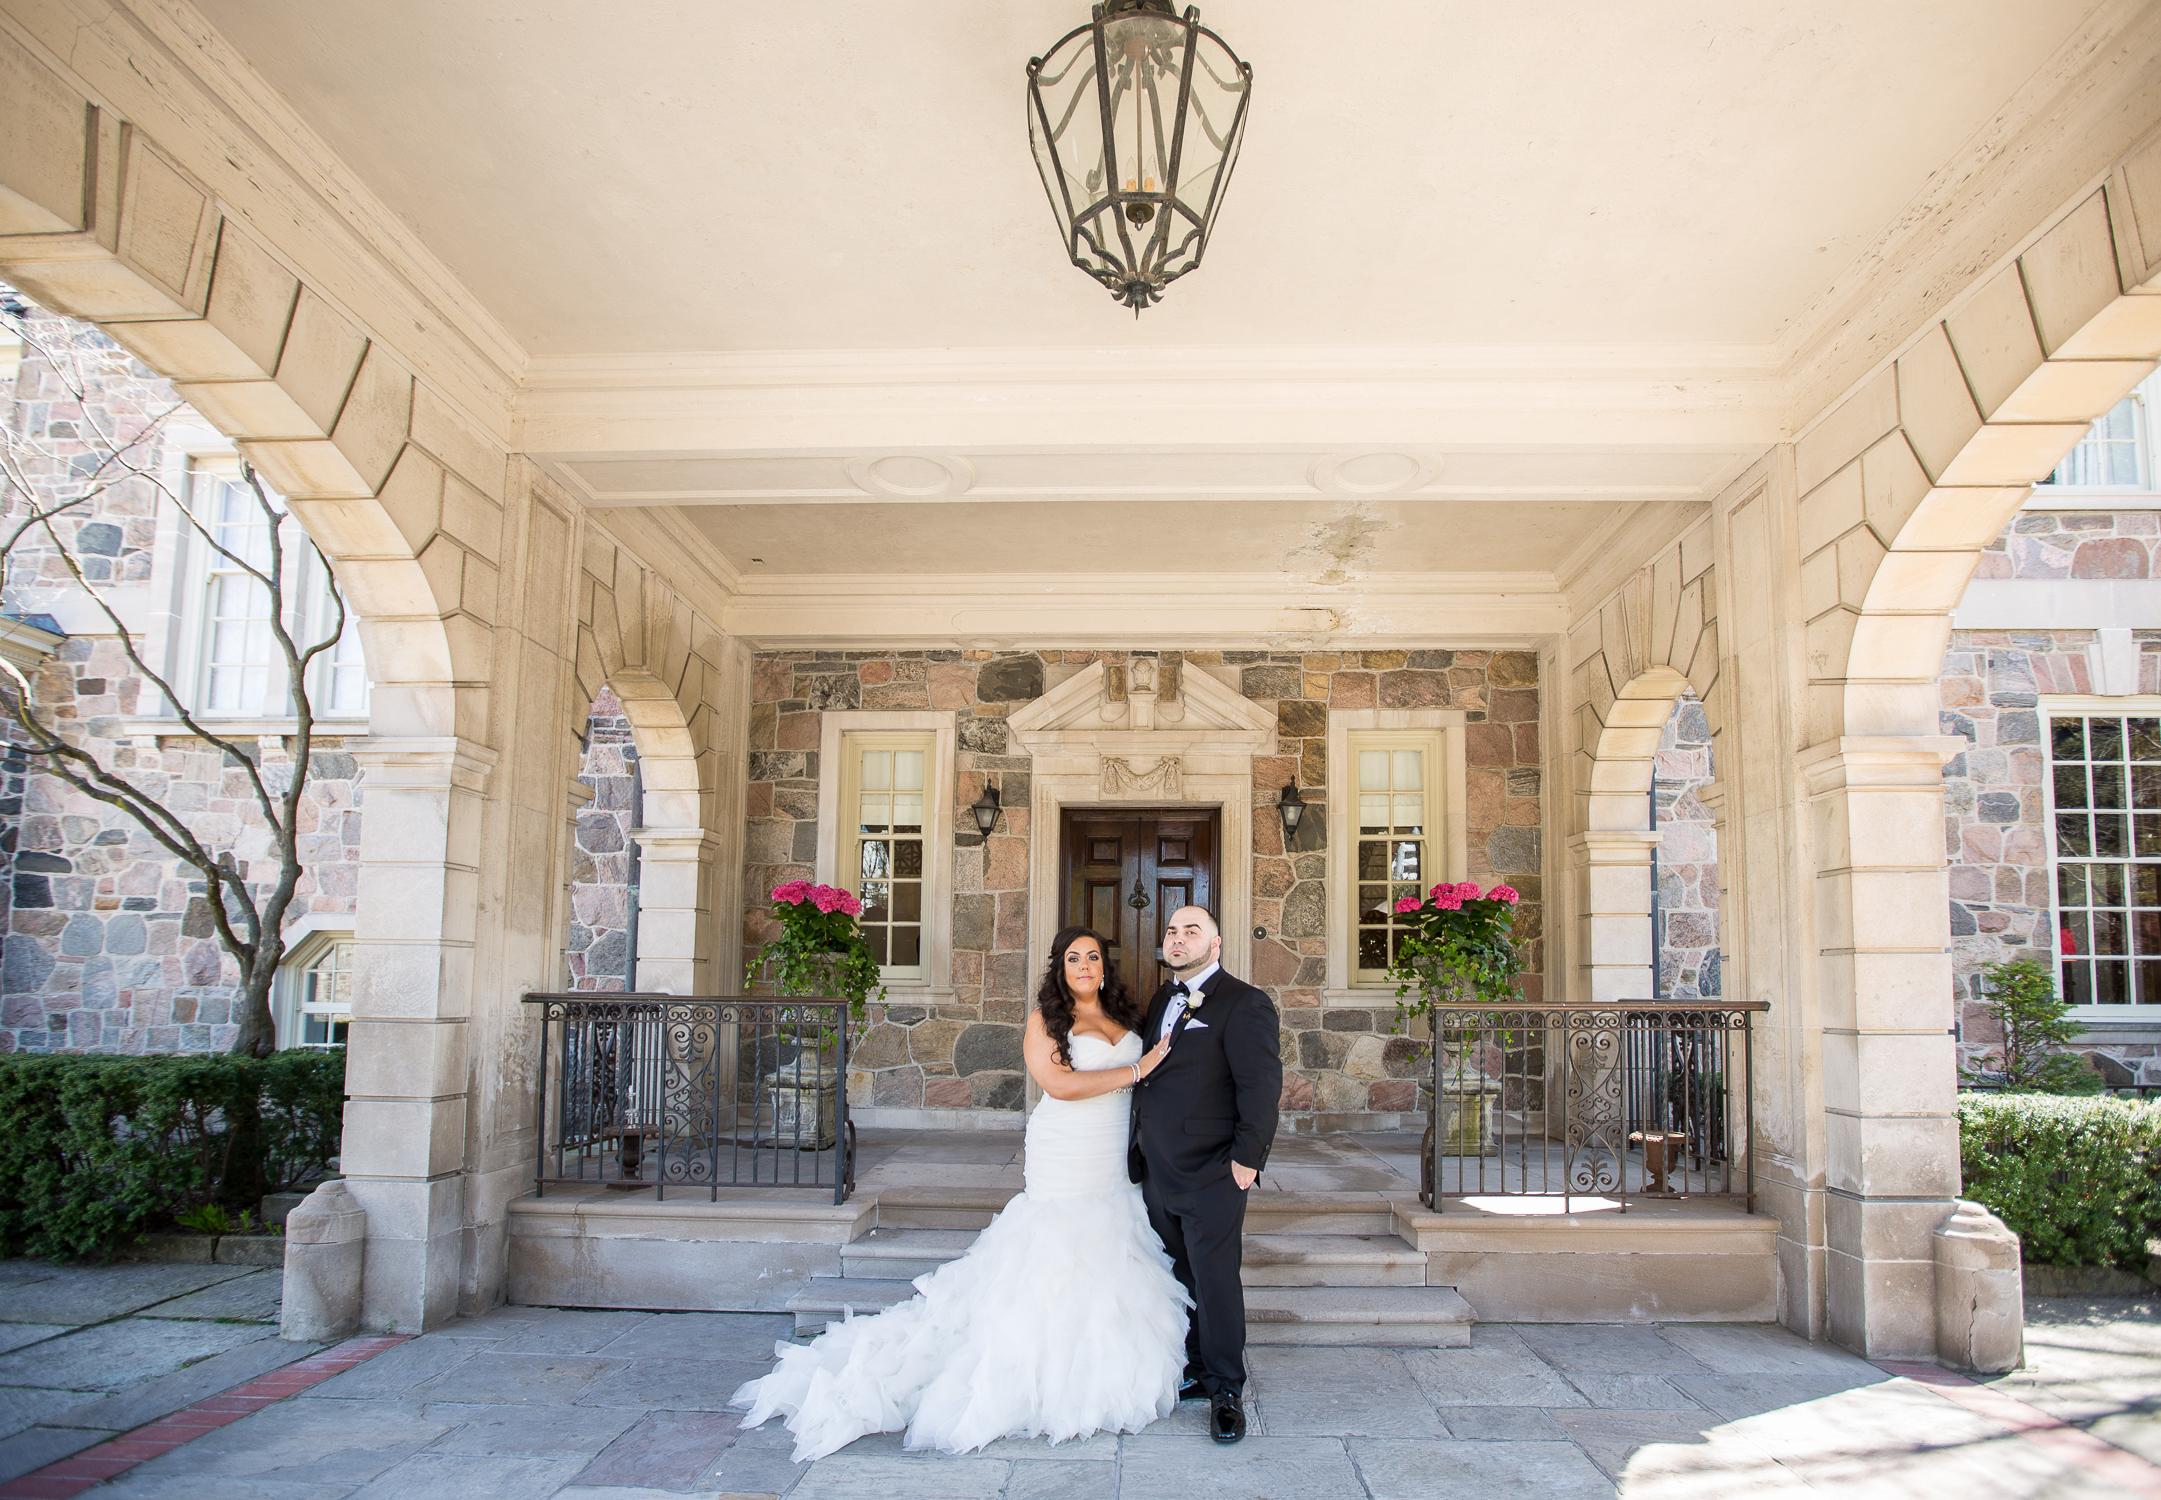 Peter-and-Marie-Wedding-Fontana-Primavera-Graydon-Hall-Manor-Toronto-Ontario-Canada-0028.jpg